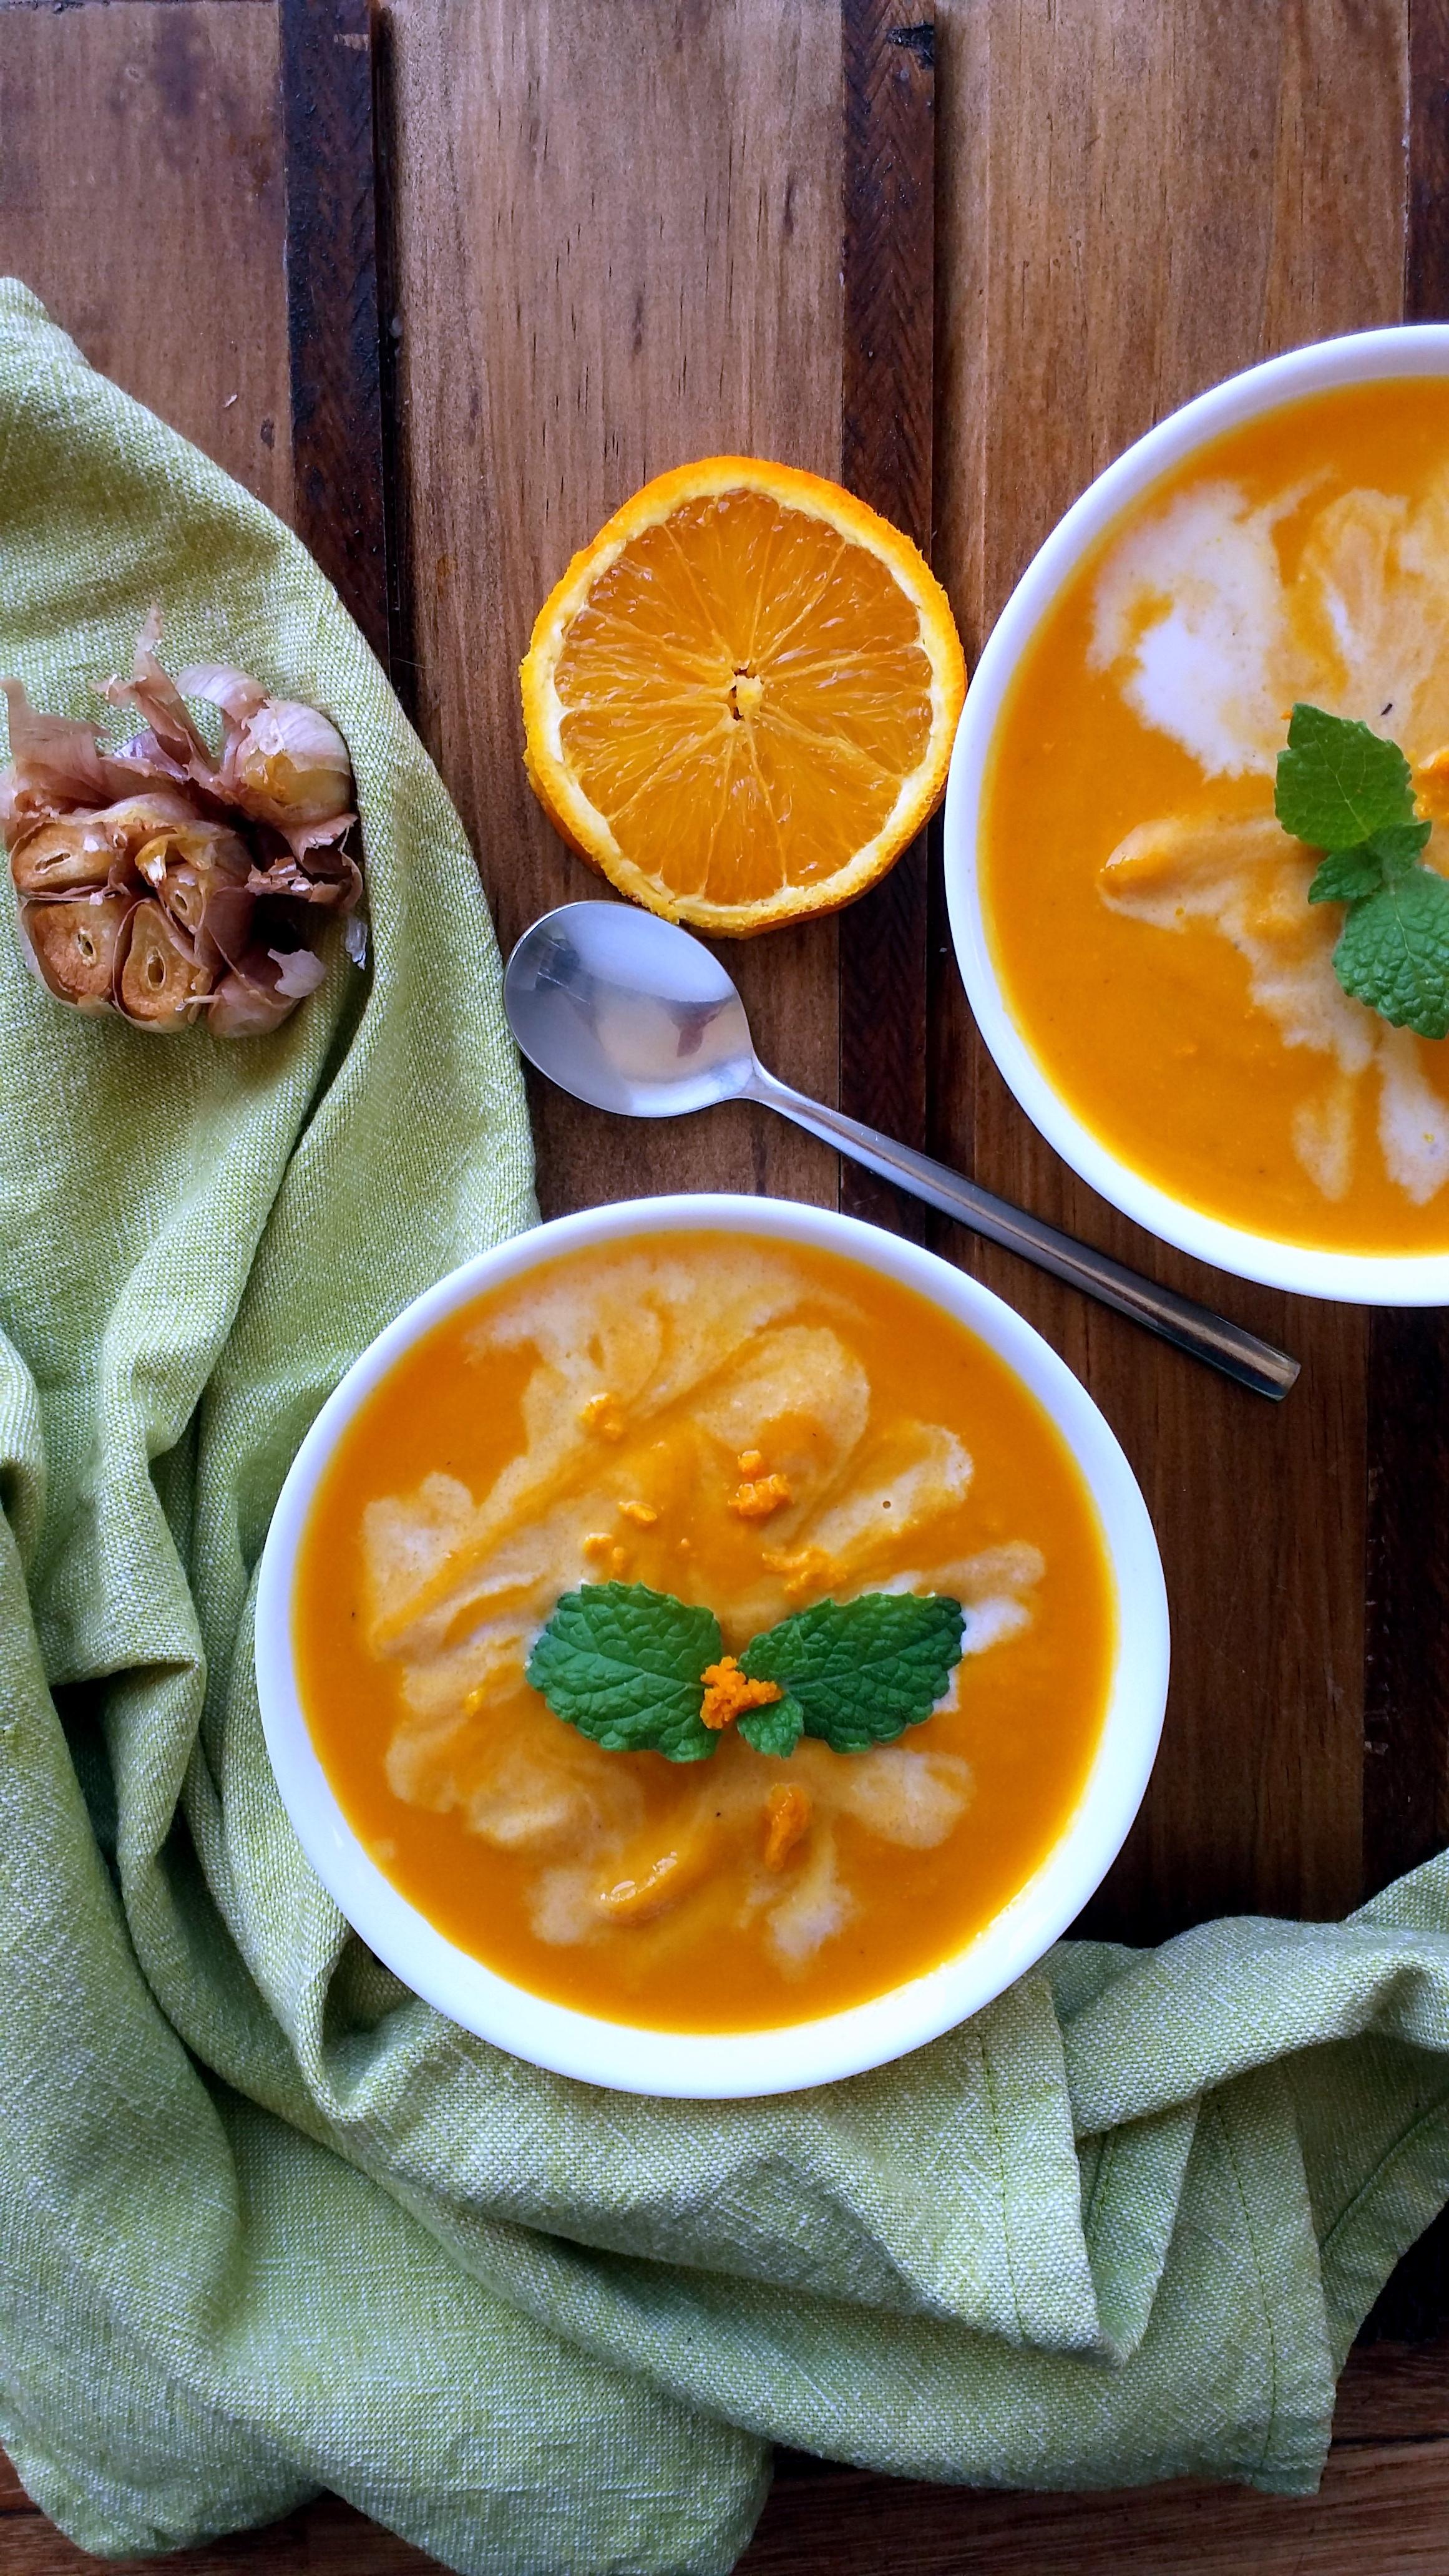 Crema Zanahoria, Porotos, Ajo Asado, y Naranja 2